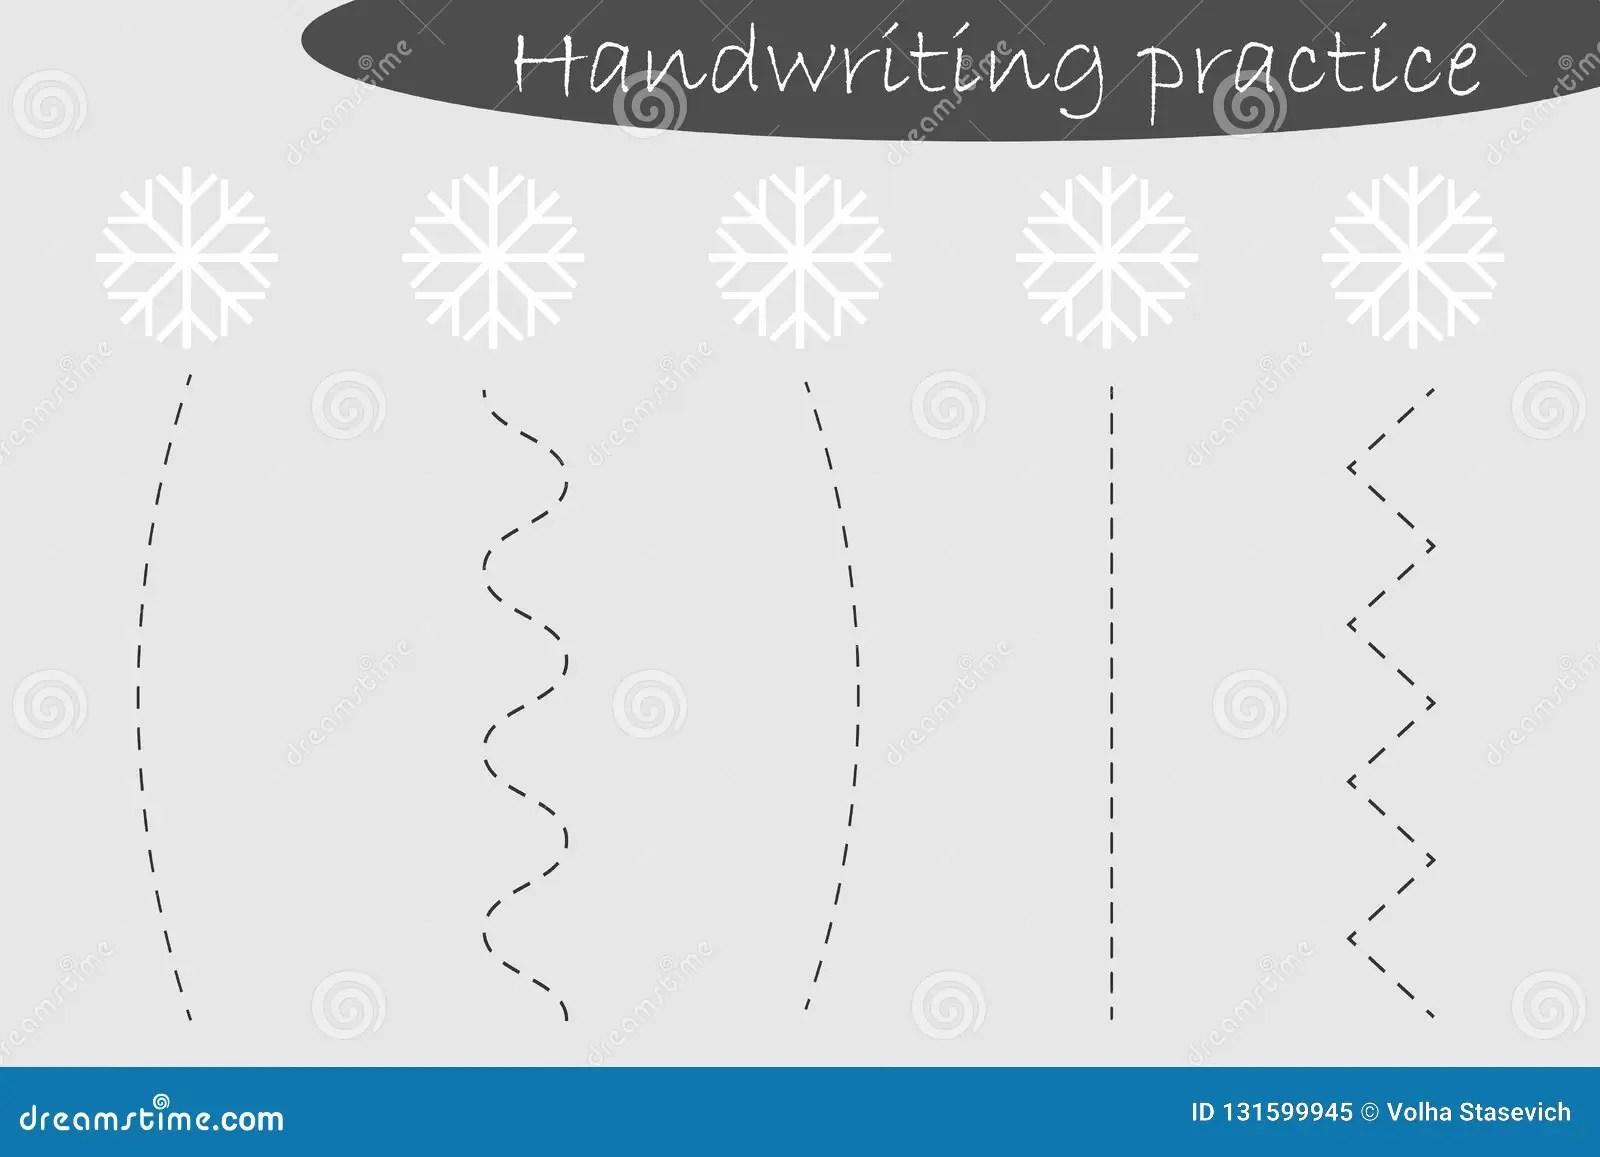 Handwriting Practice Sheet Christmas Theme Snowflakes